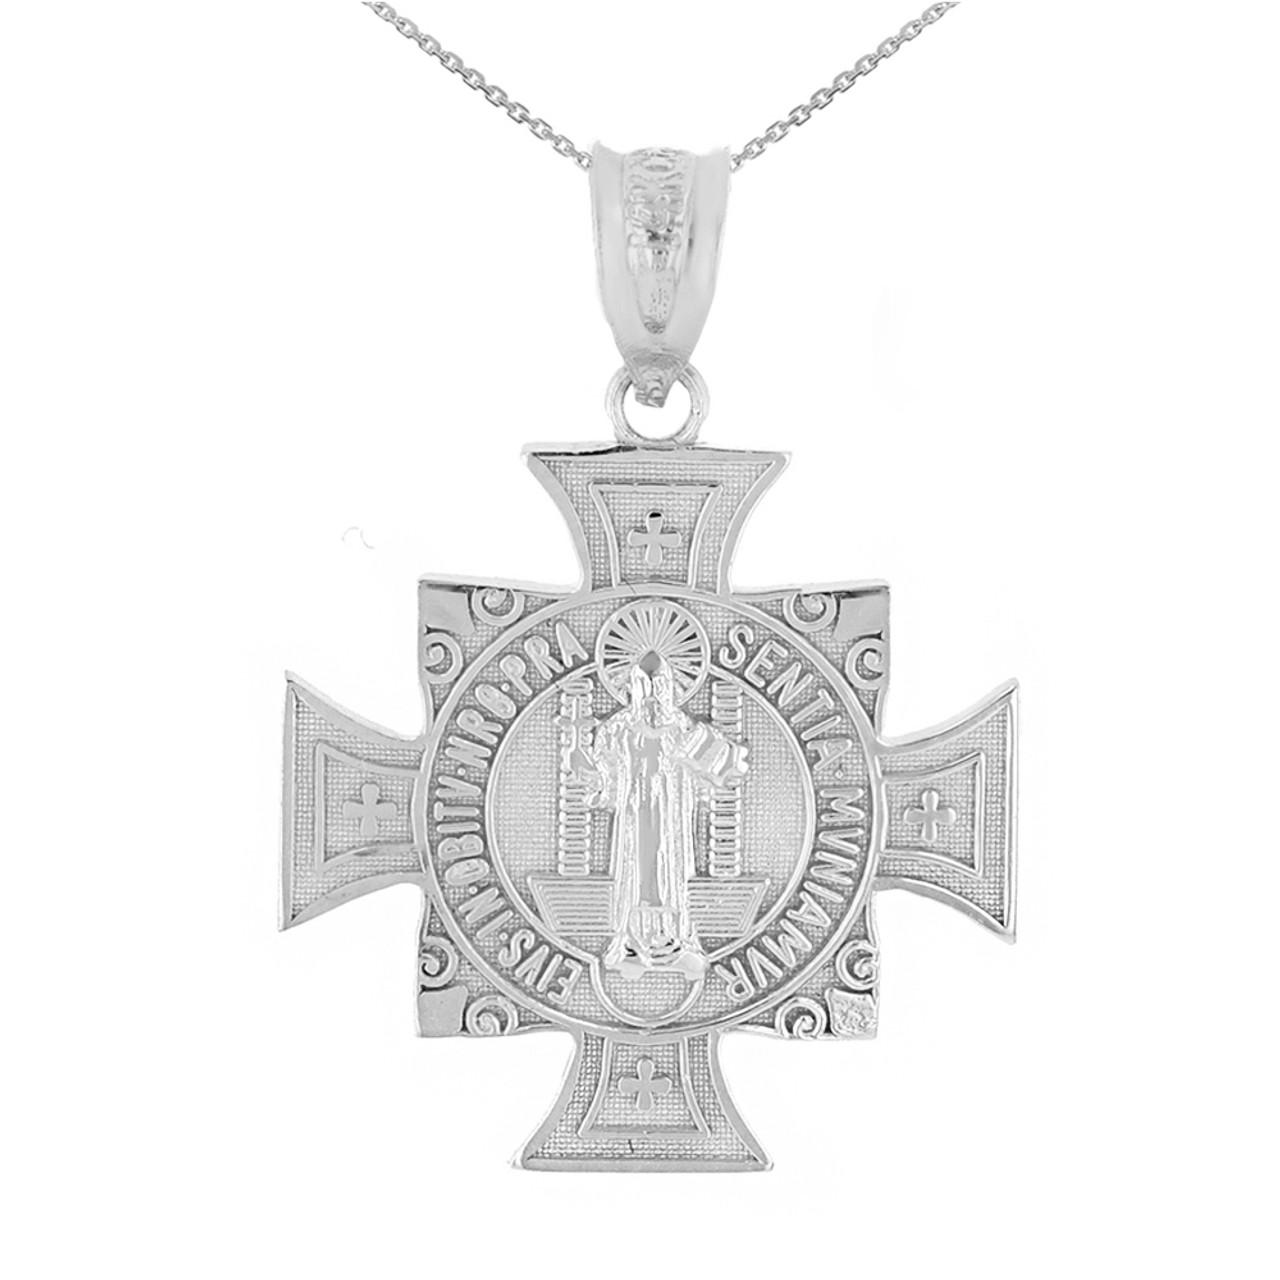 White gold saint benedict cross pendant necklace 106 aloadofball Gallery